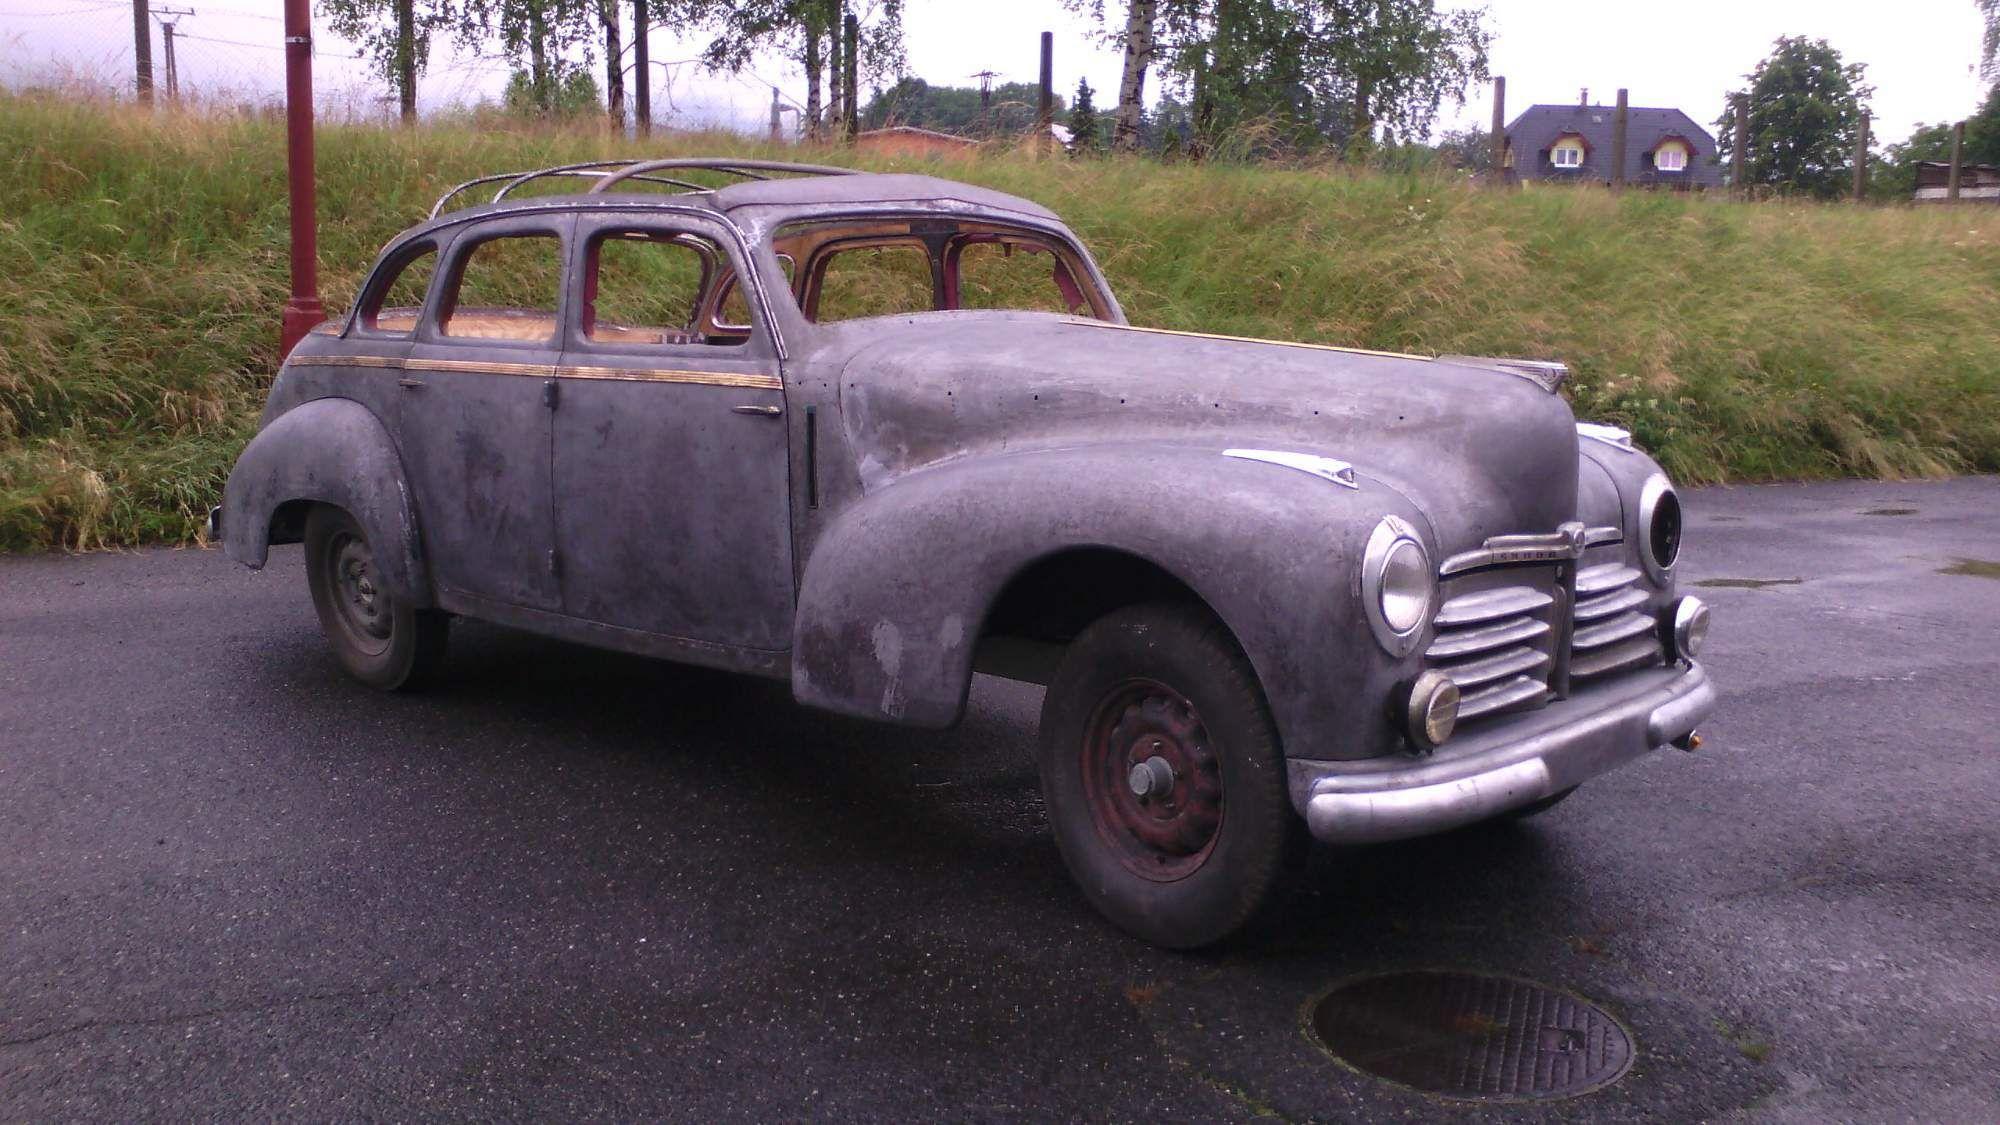 Skoda Superb Czechoslovak Classic Cars Pinterest Cars